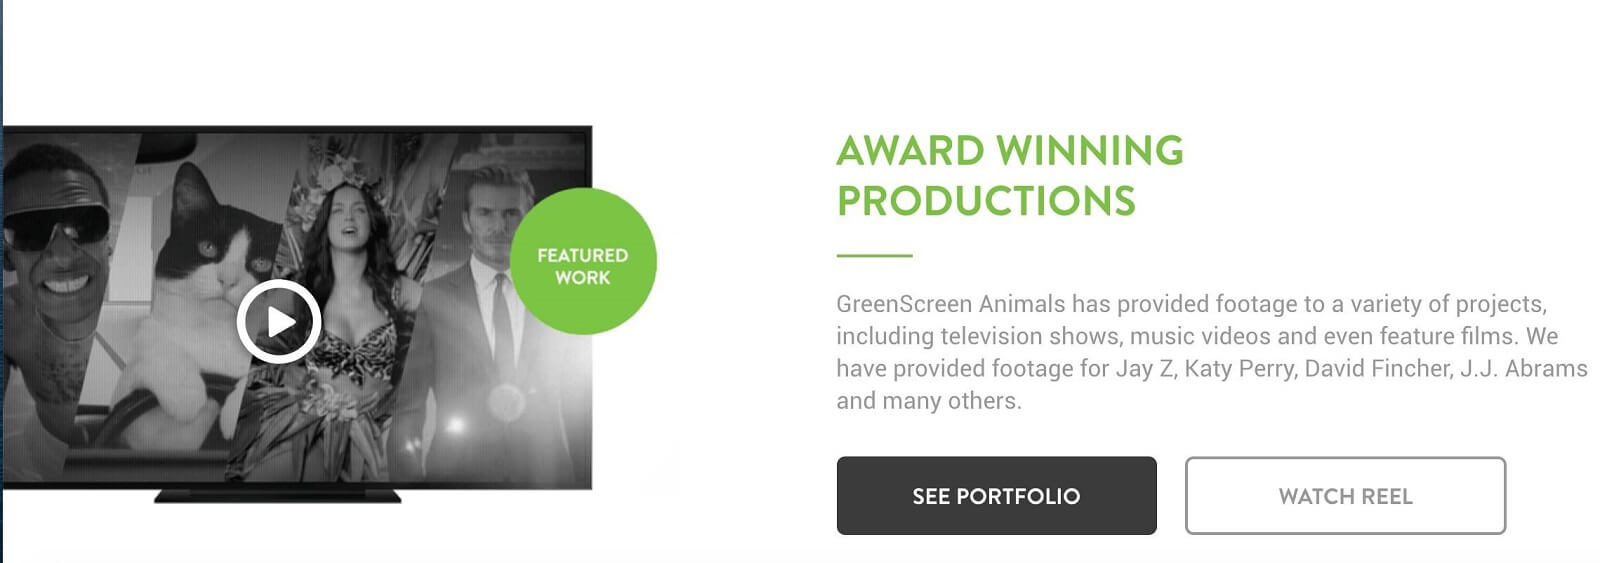 Best Green Screen Background Video - Portfolio - Green Screen Animals